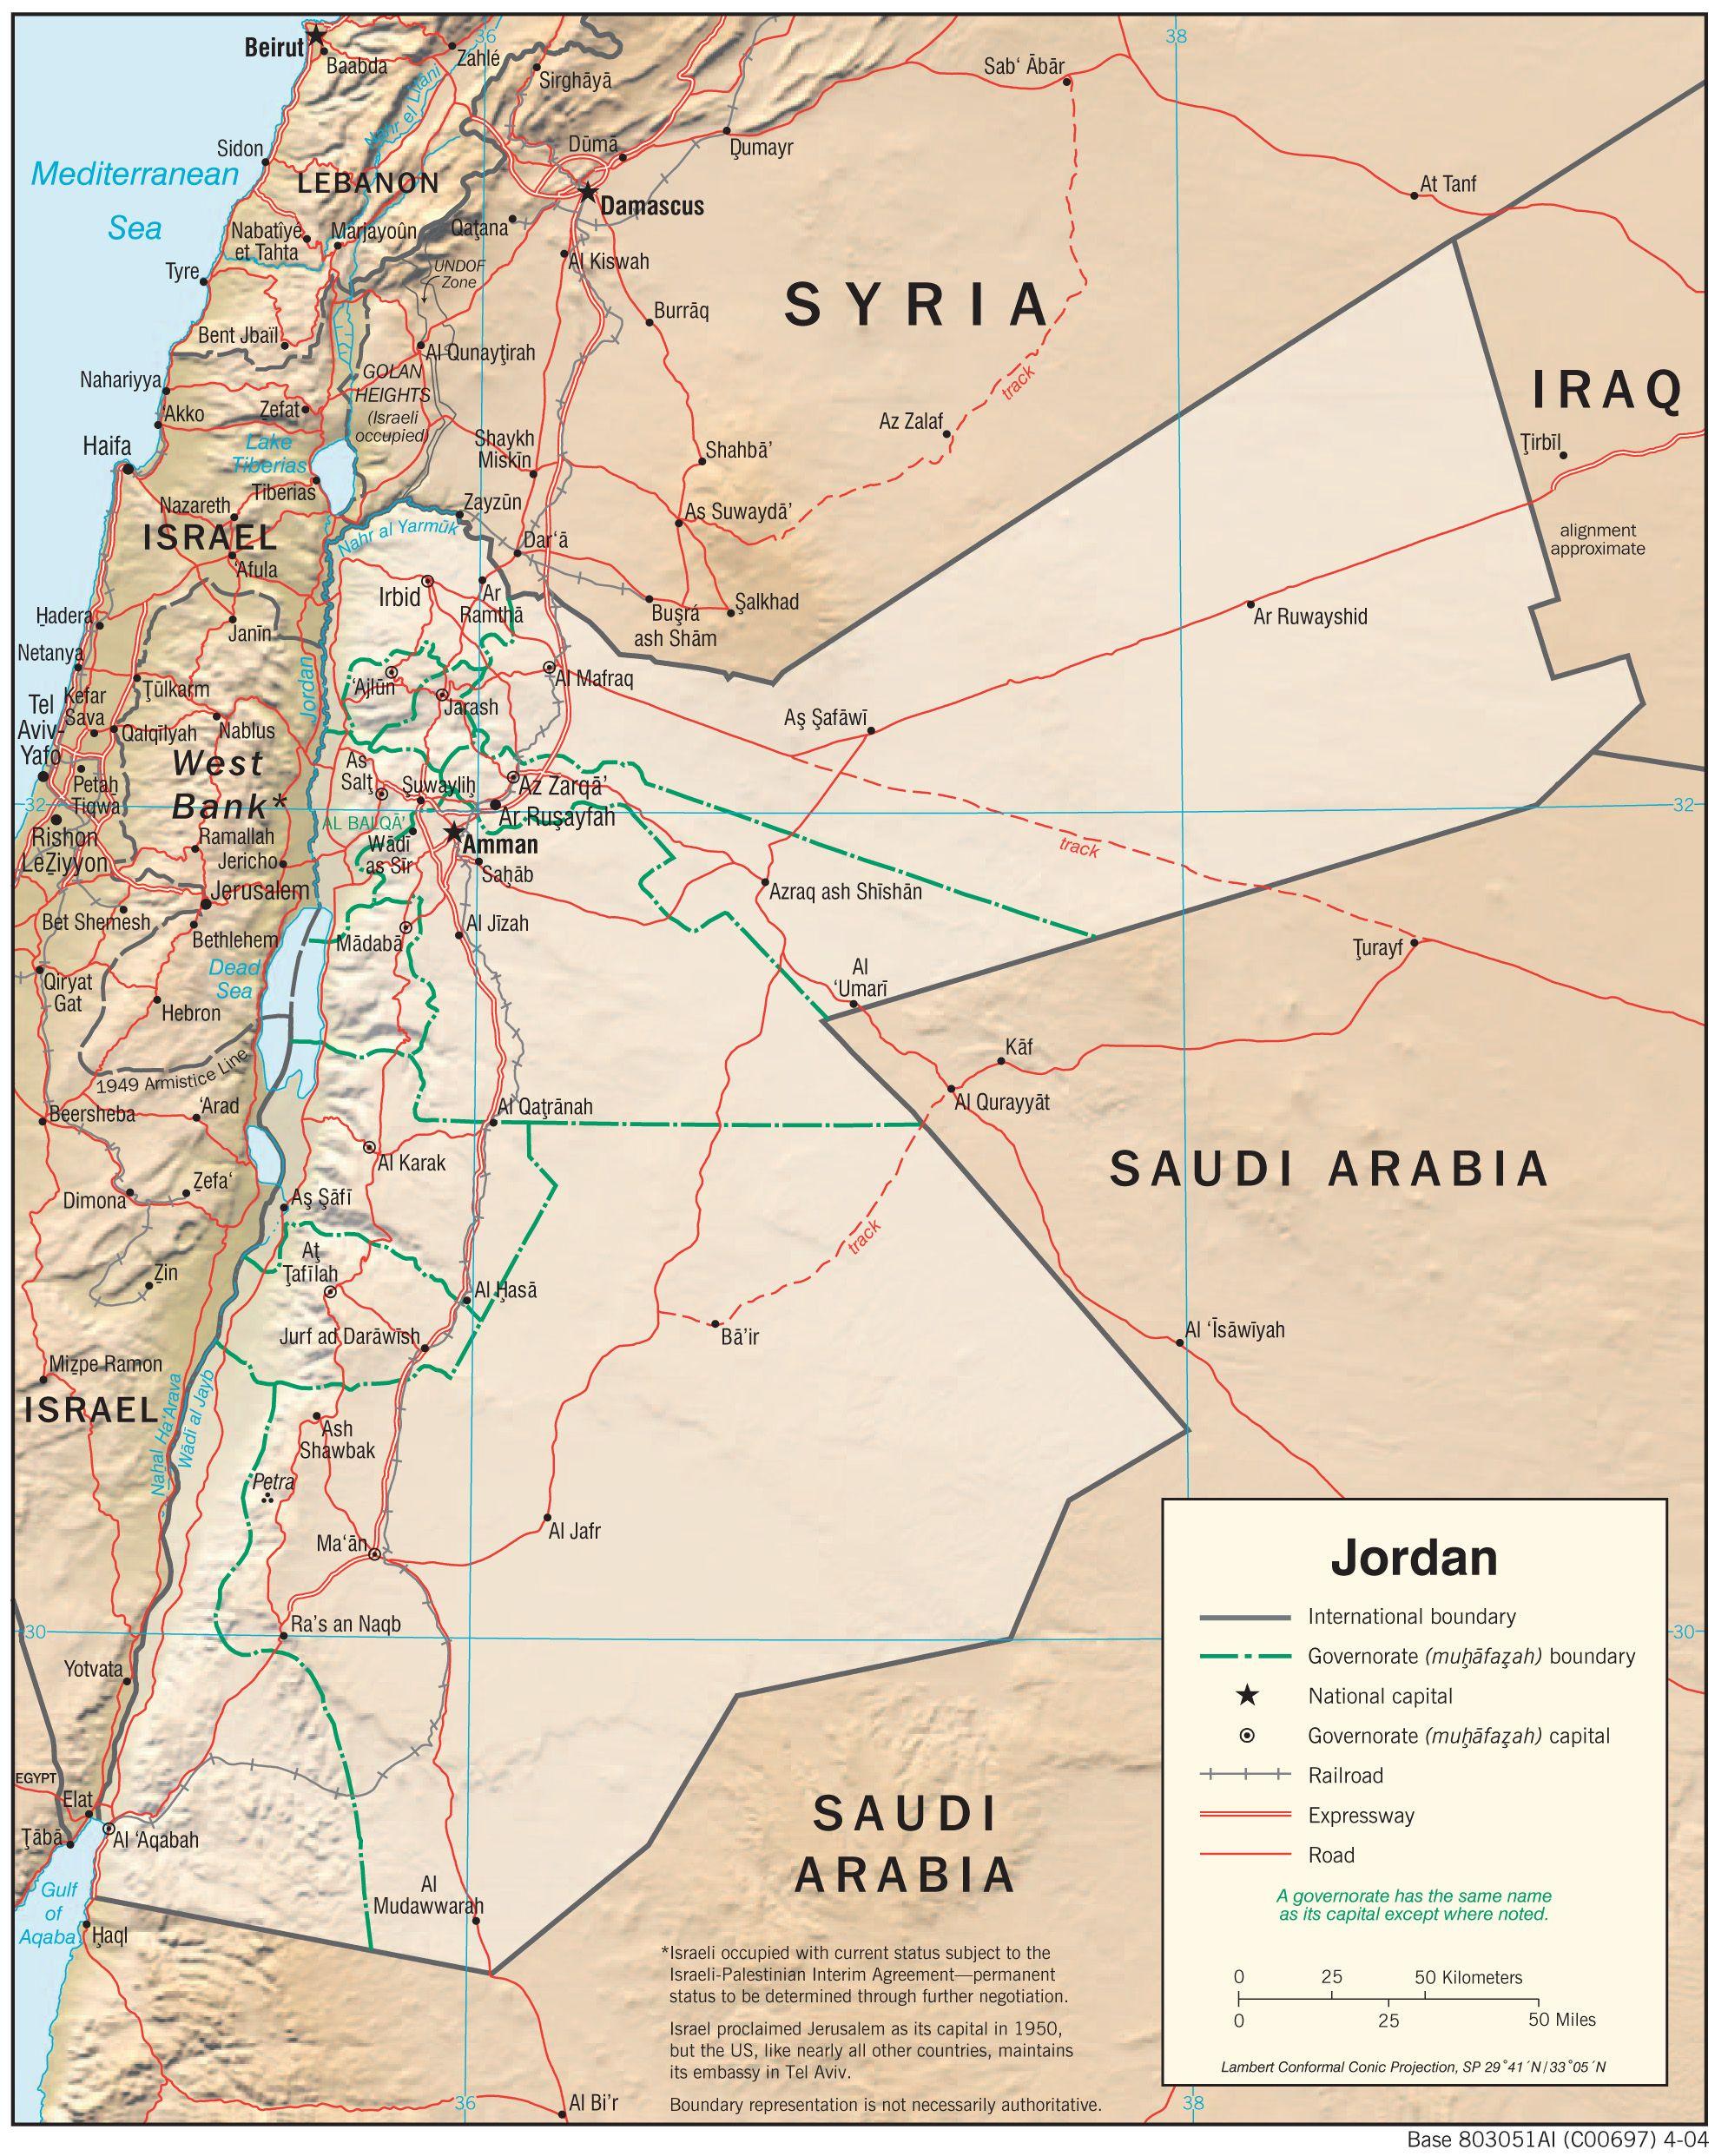 Jordan 6528061 capital amman life expectancy 8042 world jordan capital amman life expectancy world ranking 114 gumiabroncs Choice Image